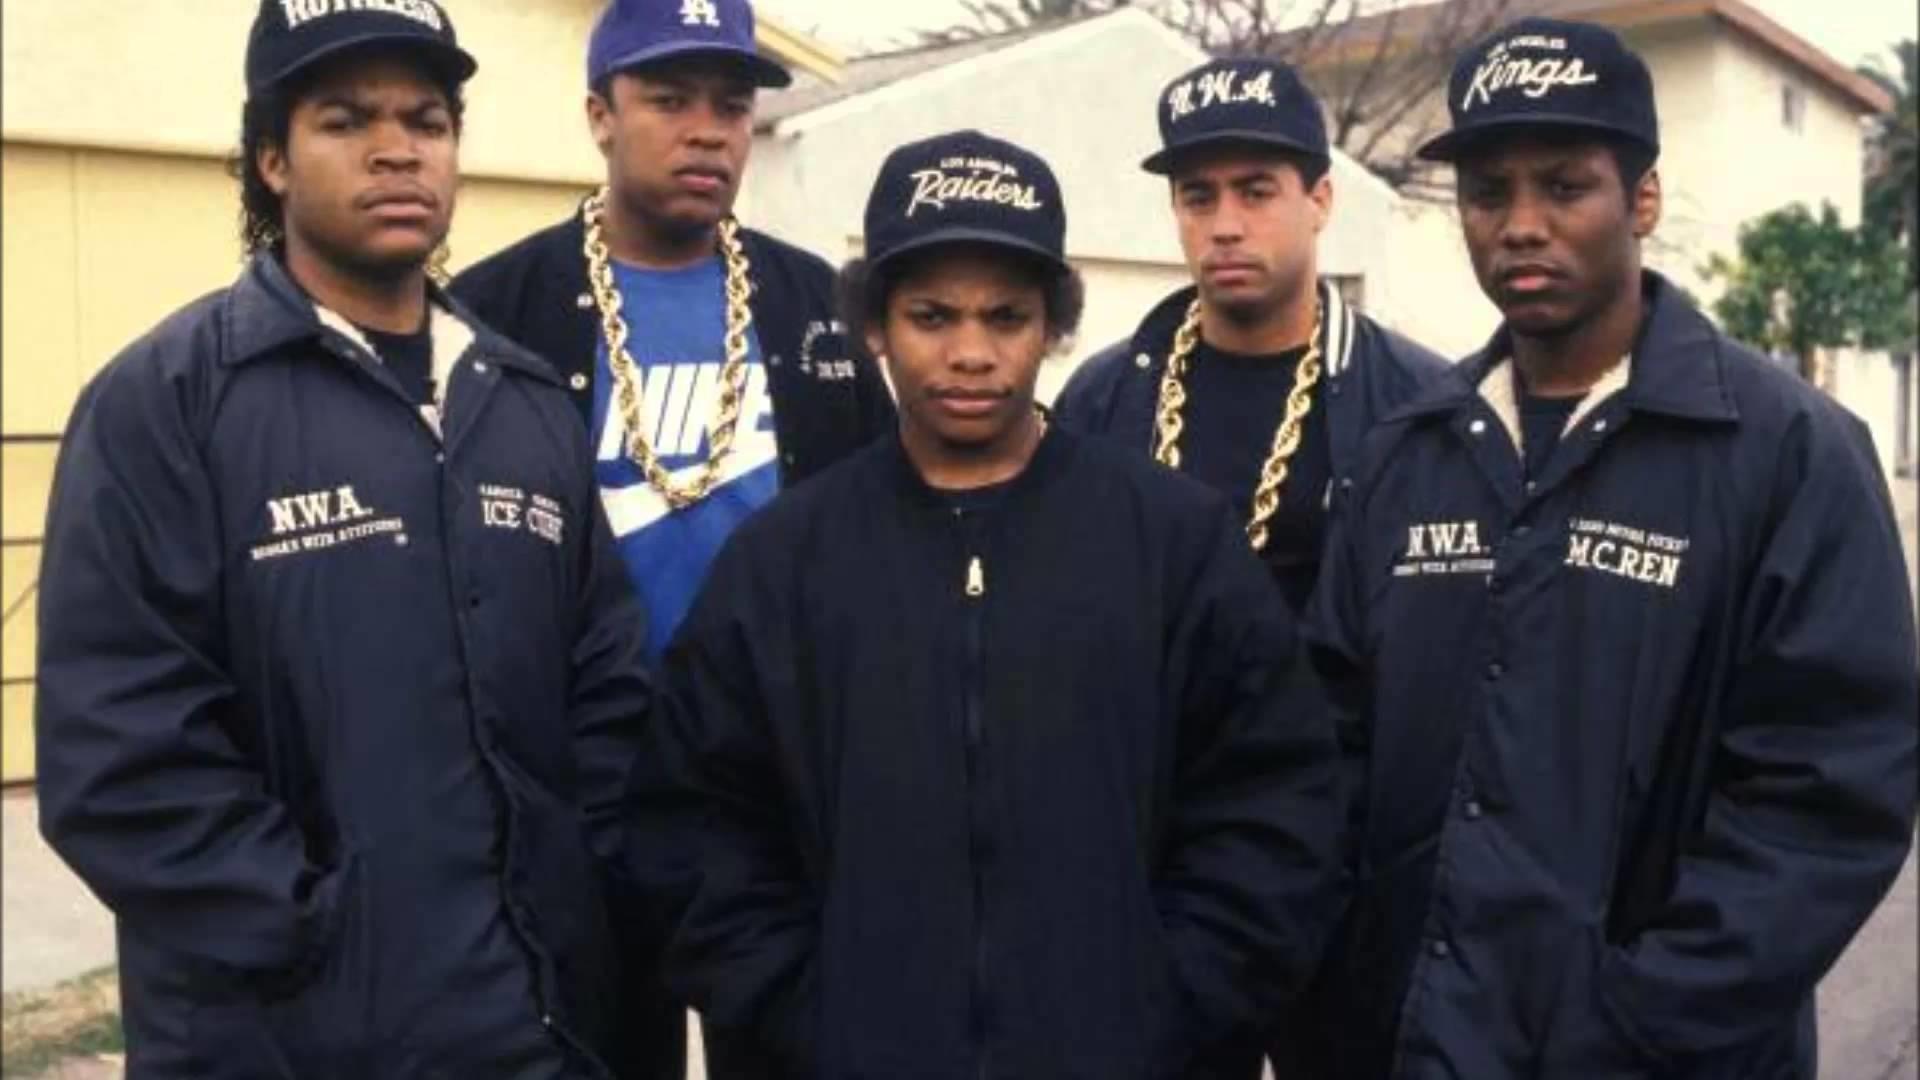 Res: 1920x1080, N.W.A records 'F--- Tha Police' in Straight Outta Compton clip